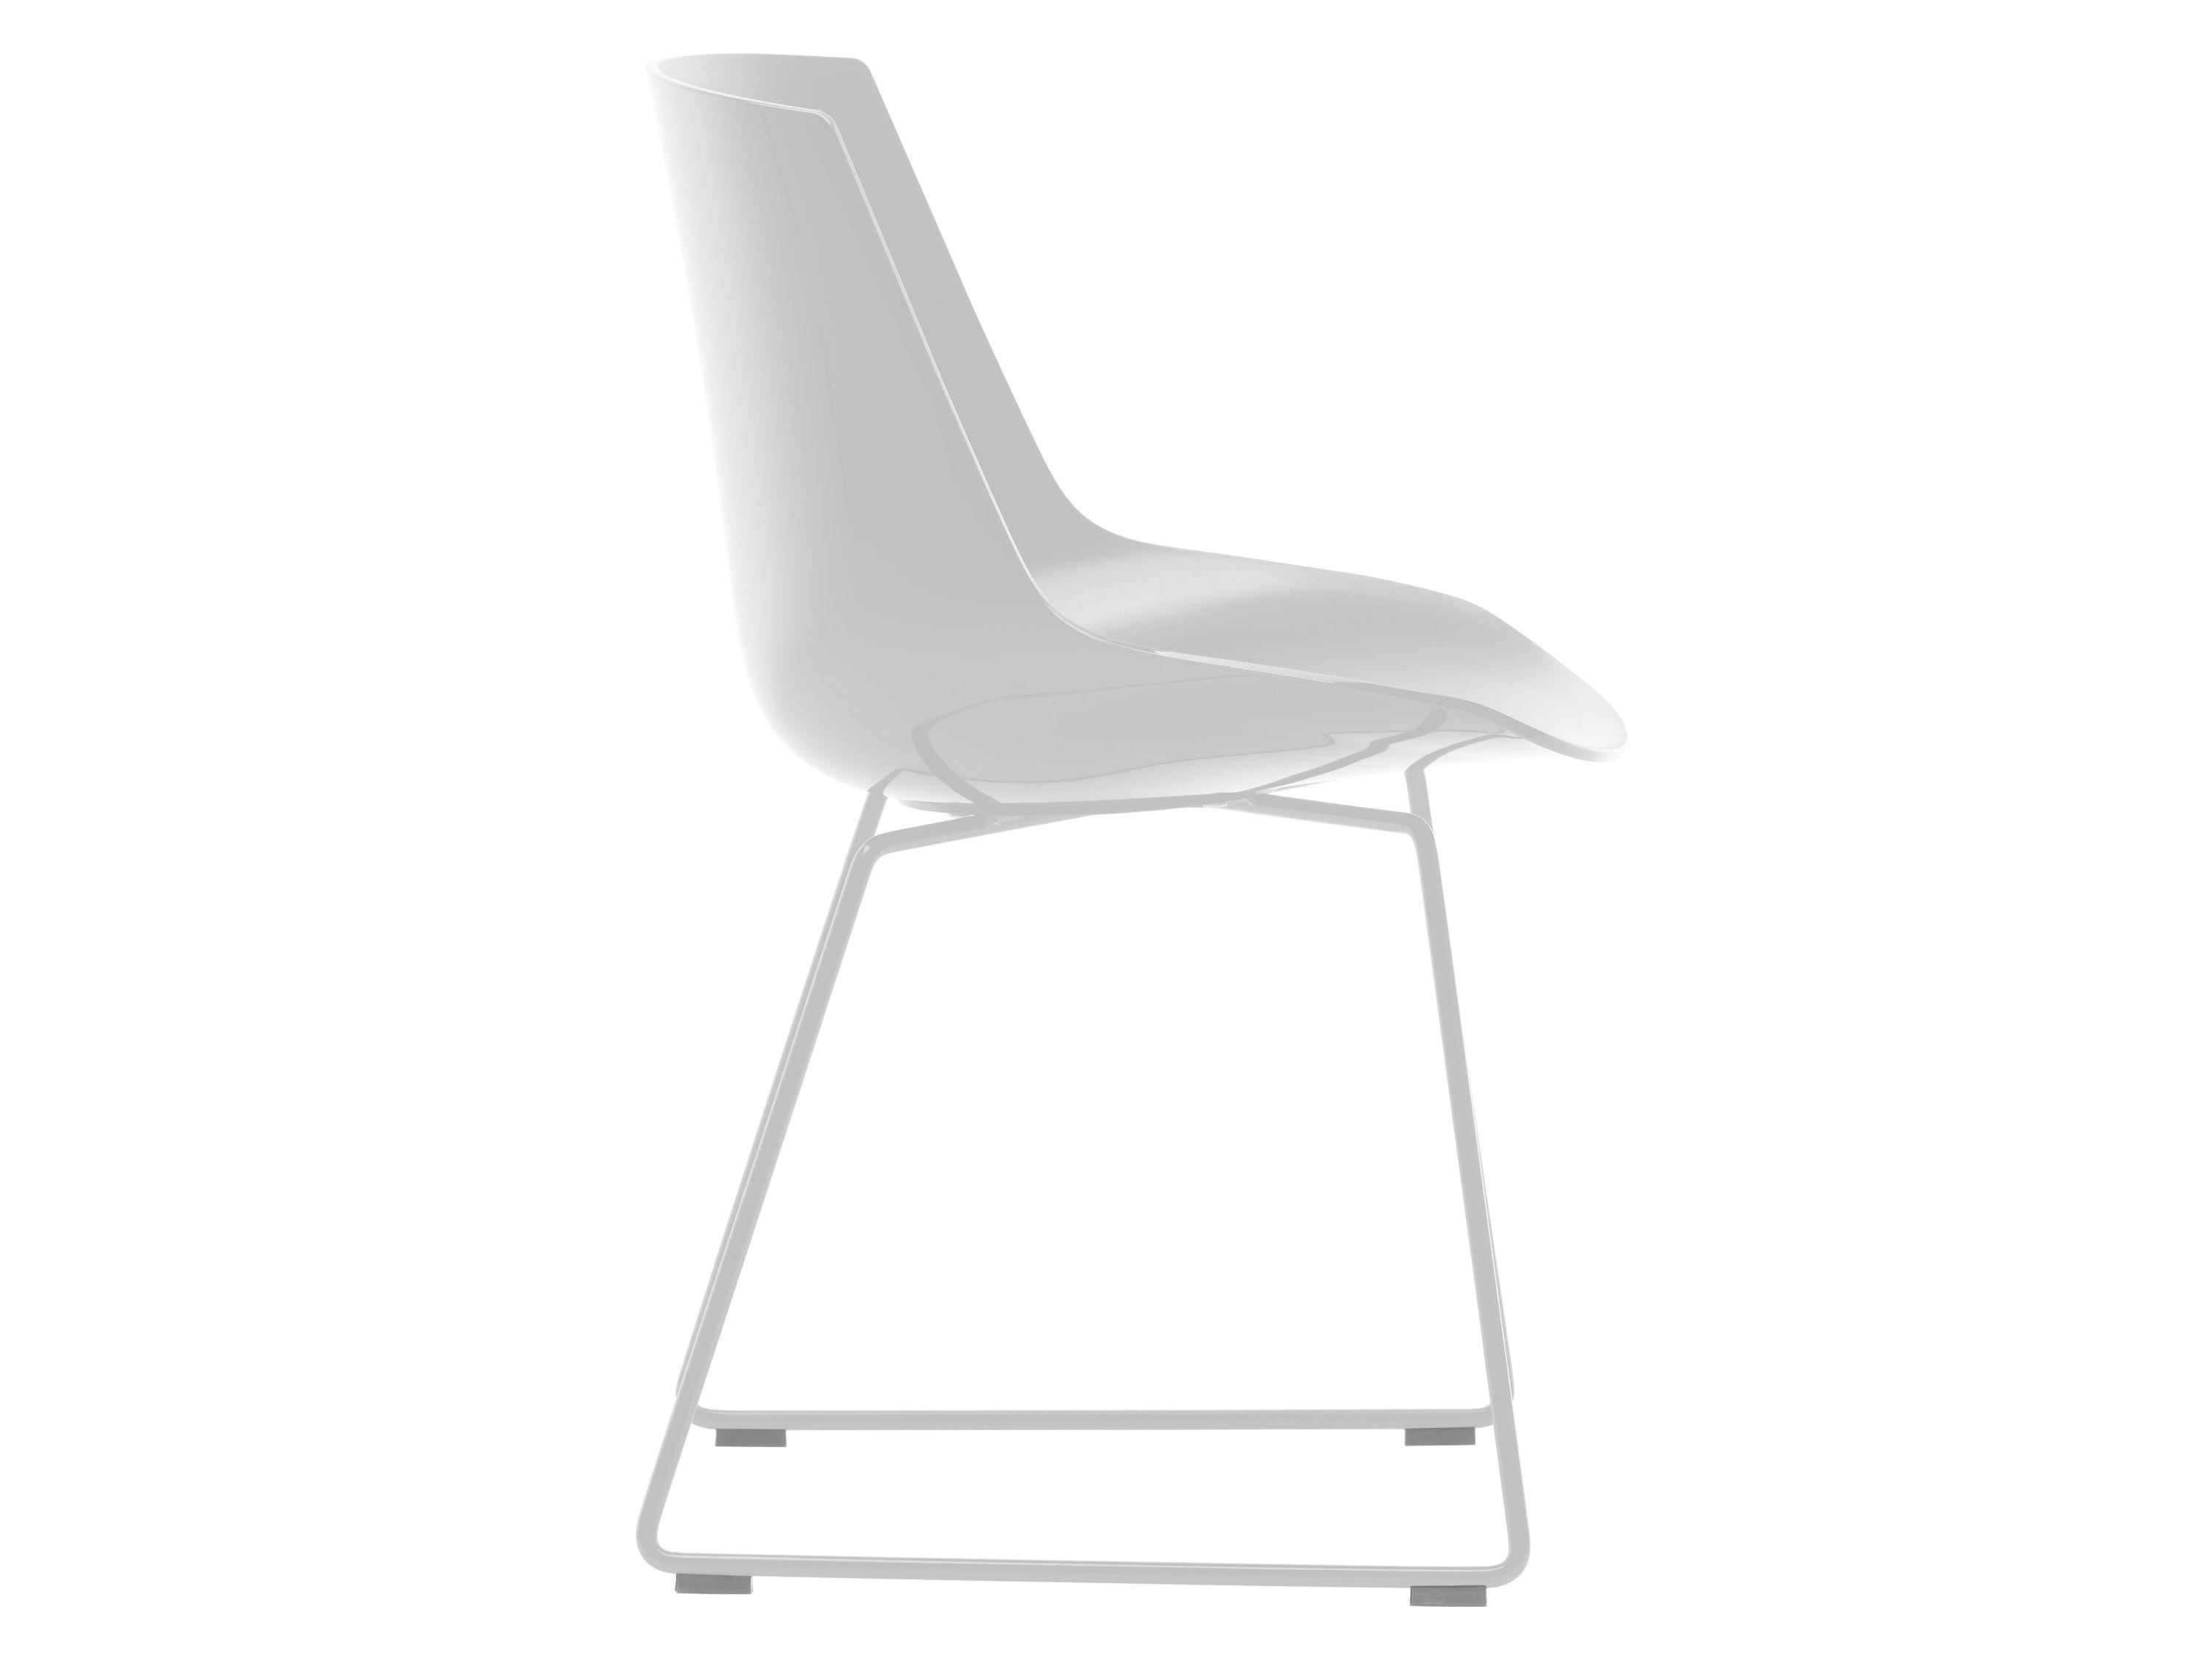 Möbel - Stühle  - Flow Stuhl Kufengestell - MDF Italia - Glänzend weiß - weißes Gestell - lackierter Stahl, Polykarbonat